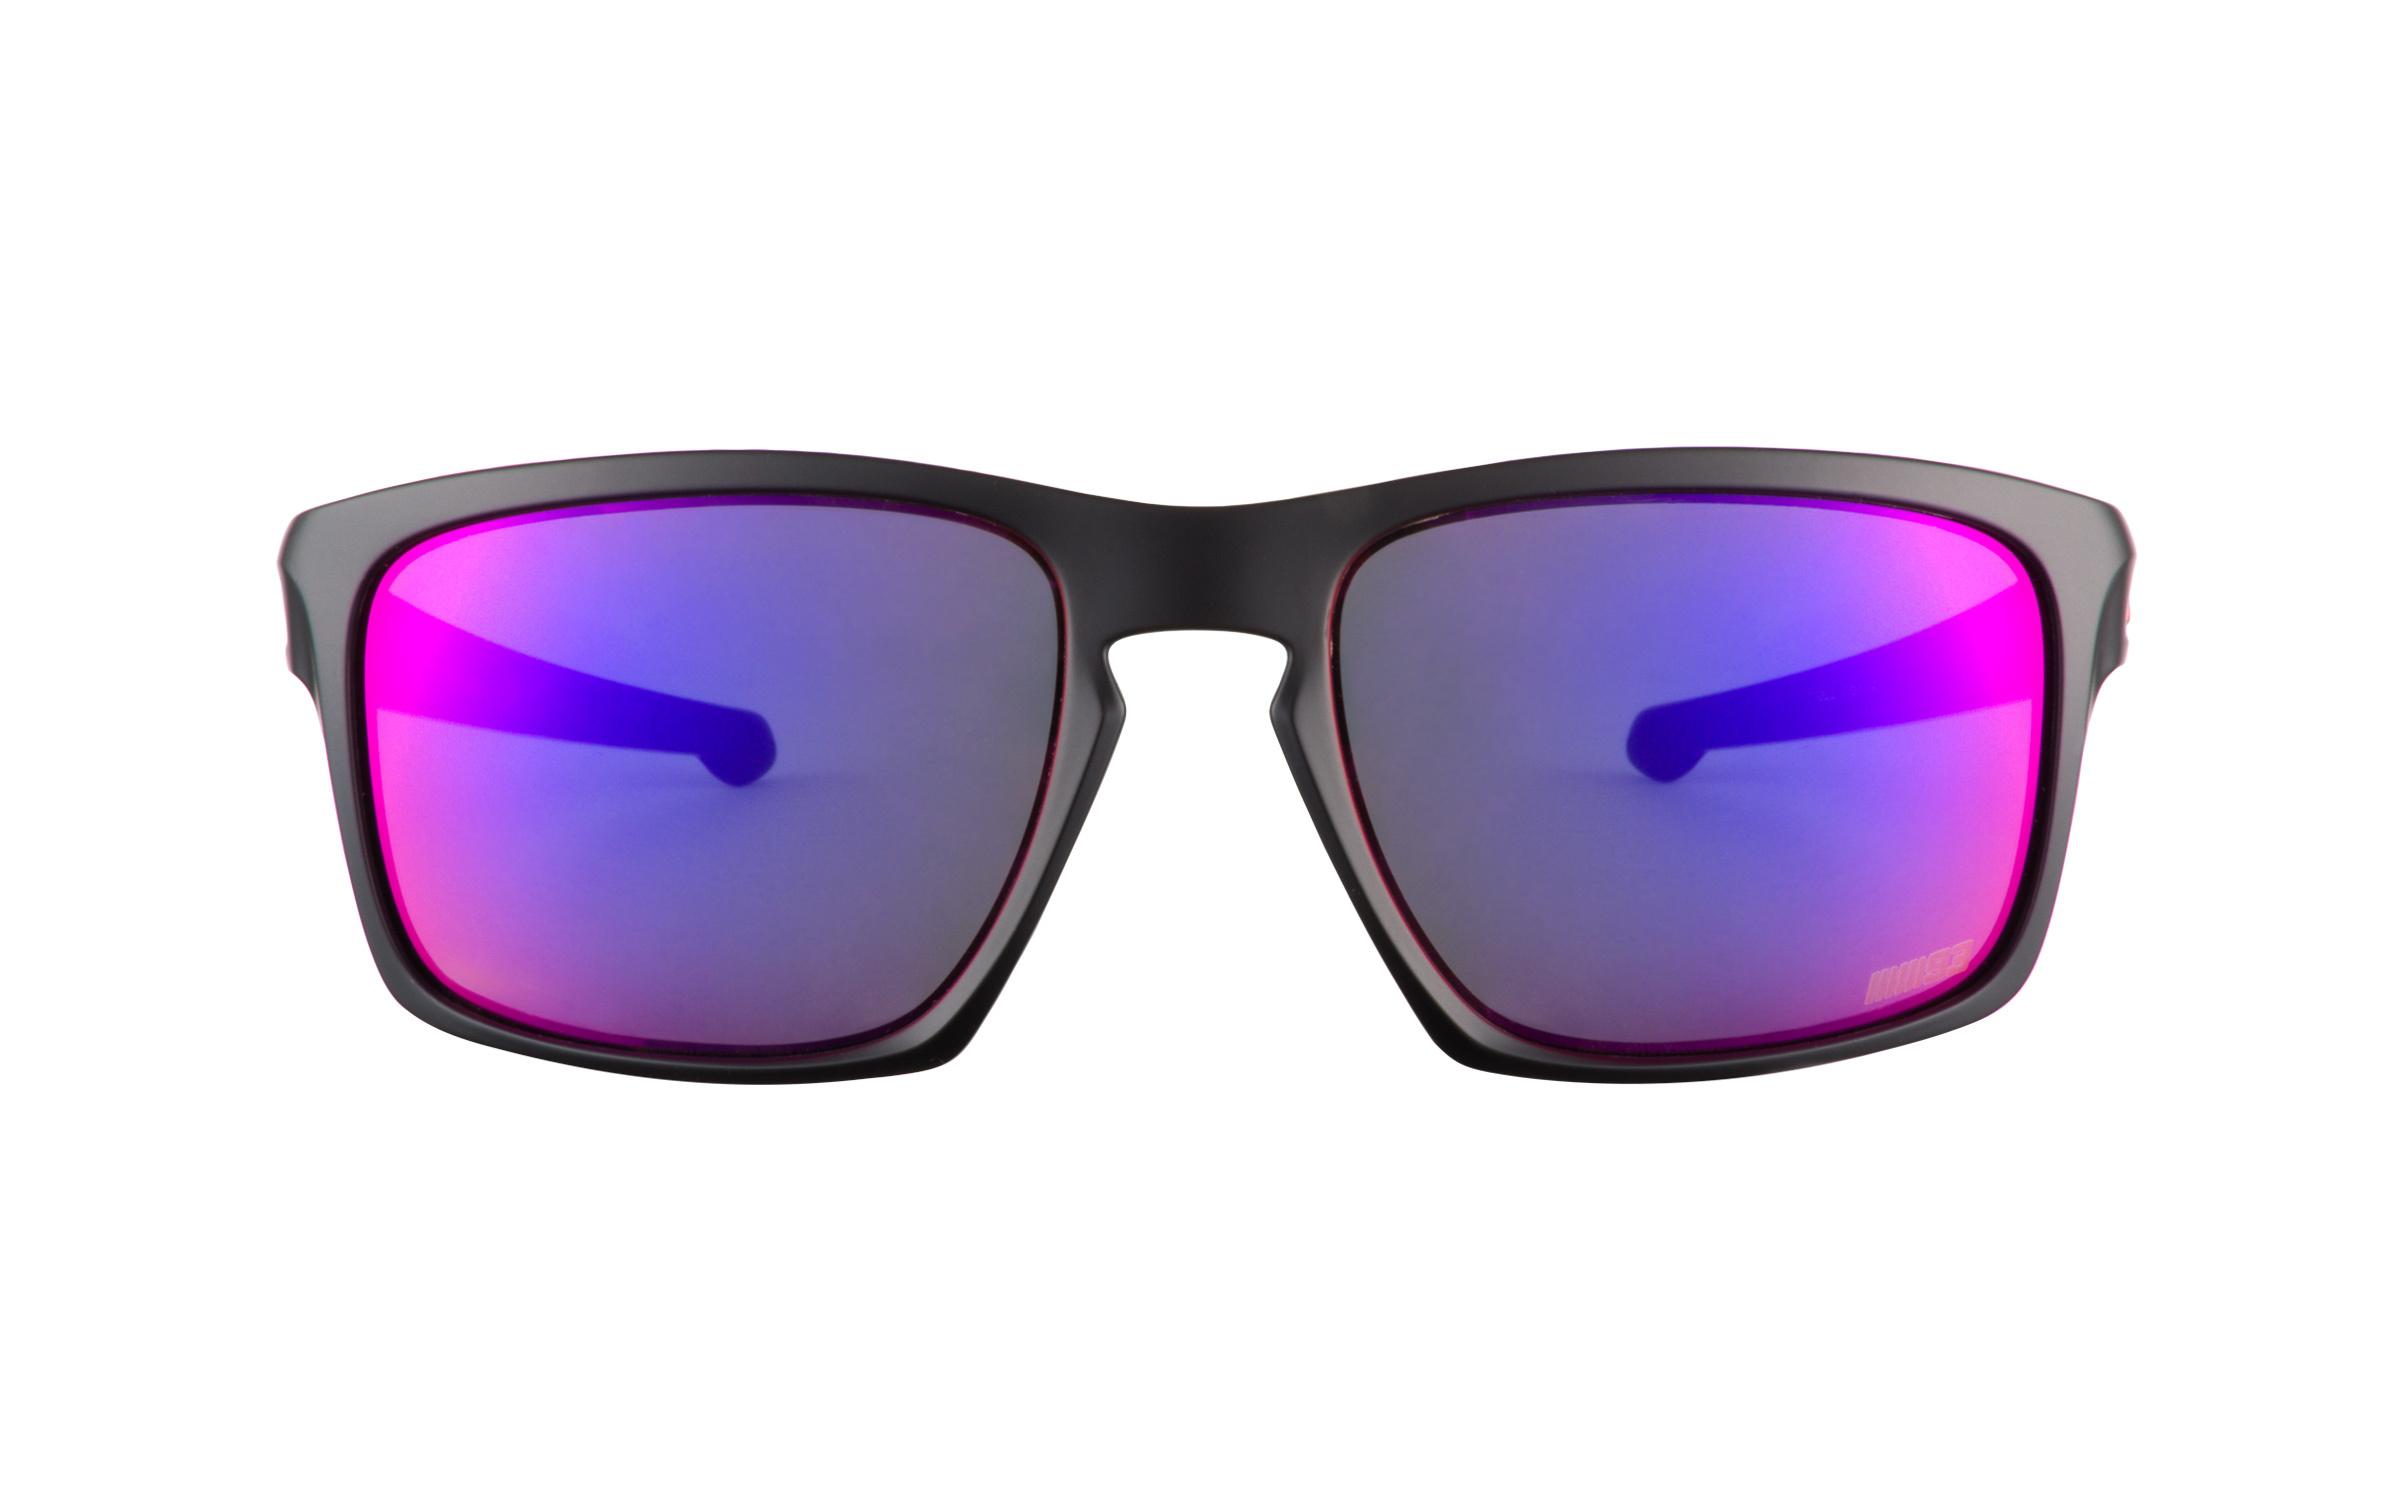 black and purple oakley sunglasses no5a  product image of Oakley Marc Marquez Matte Black